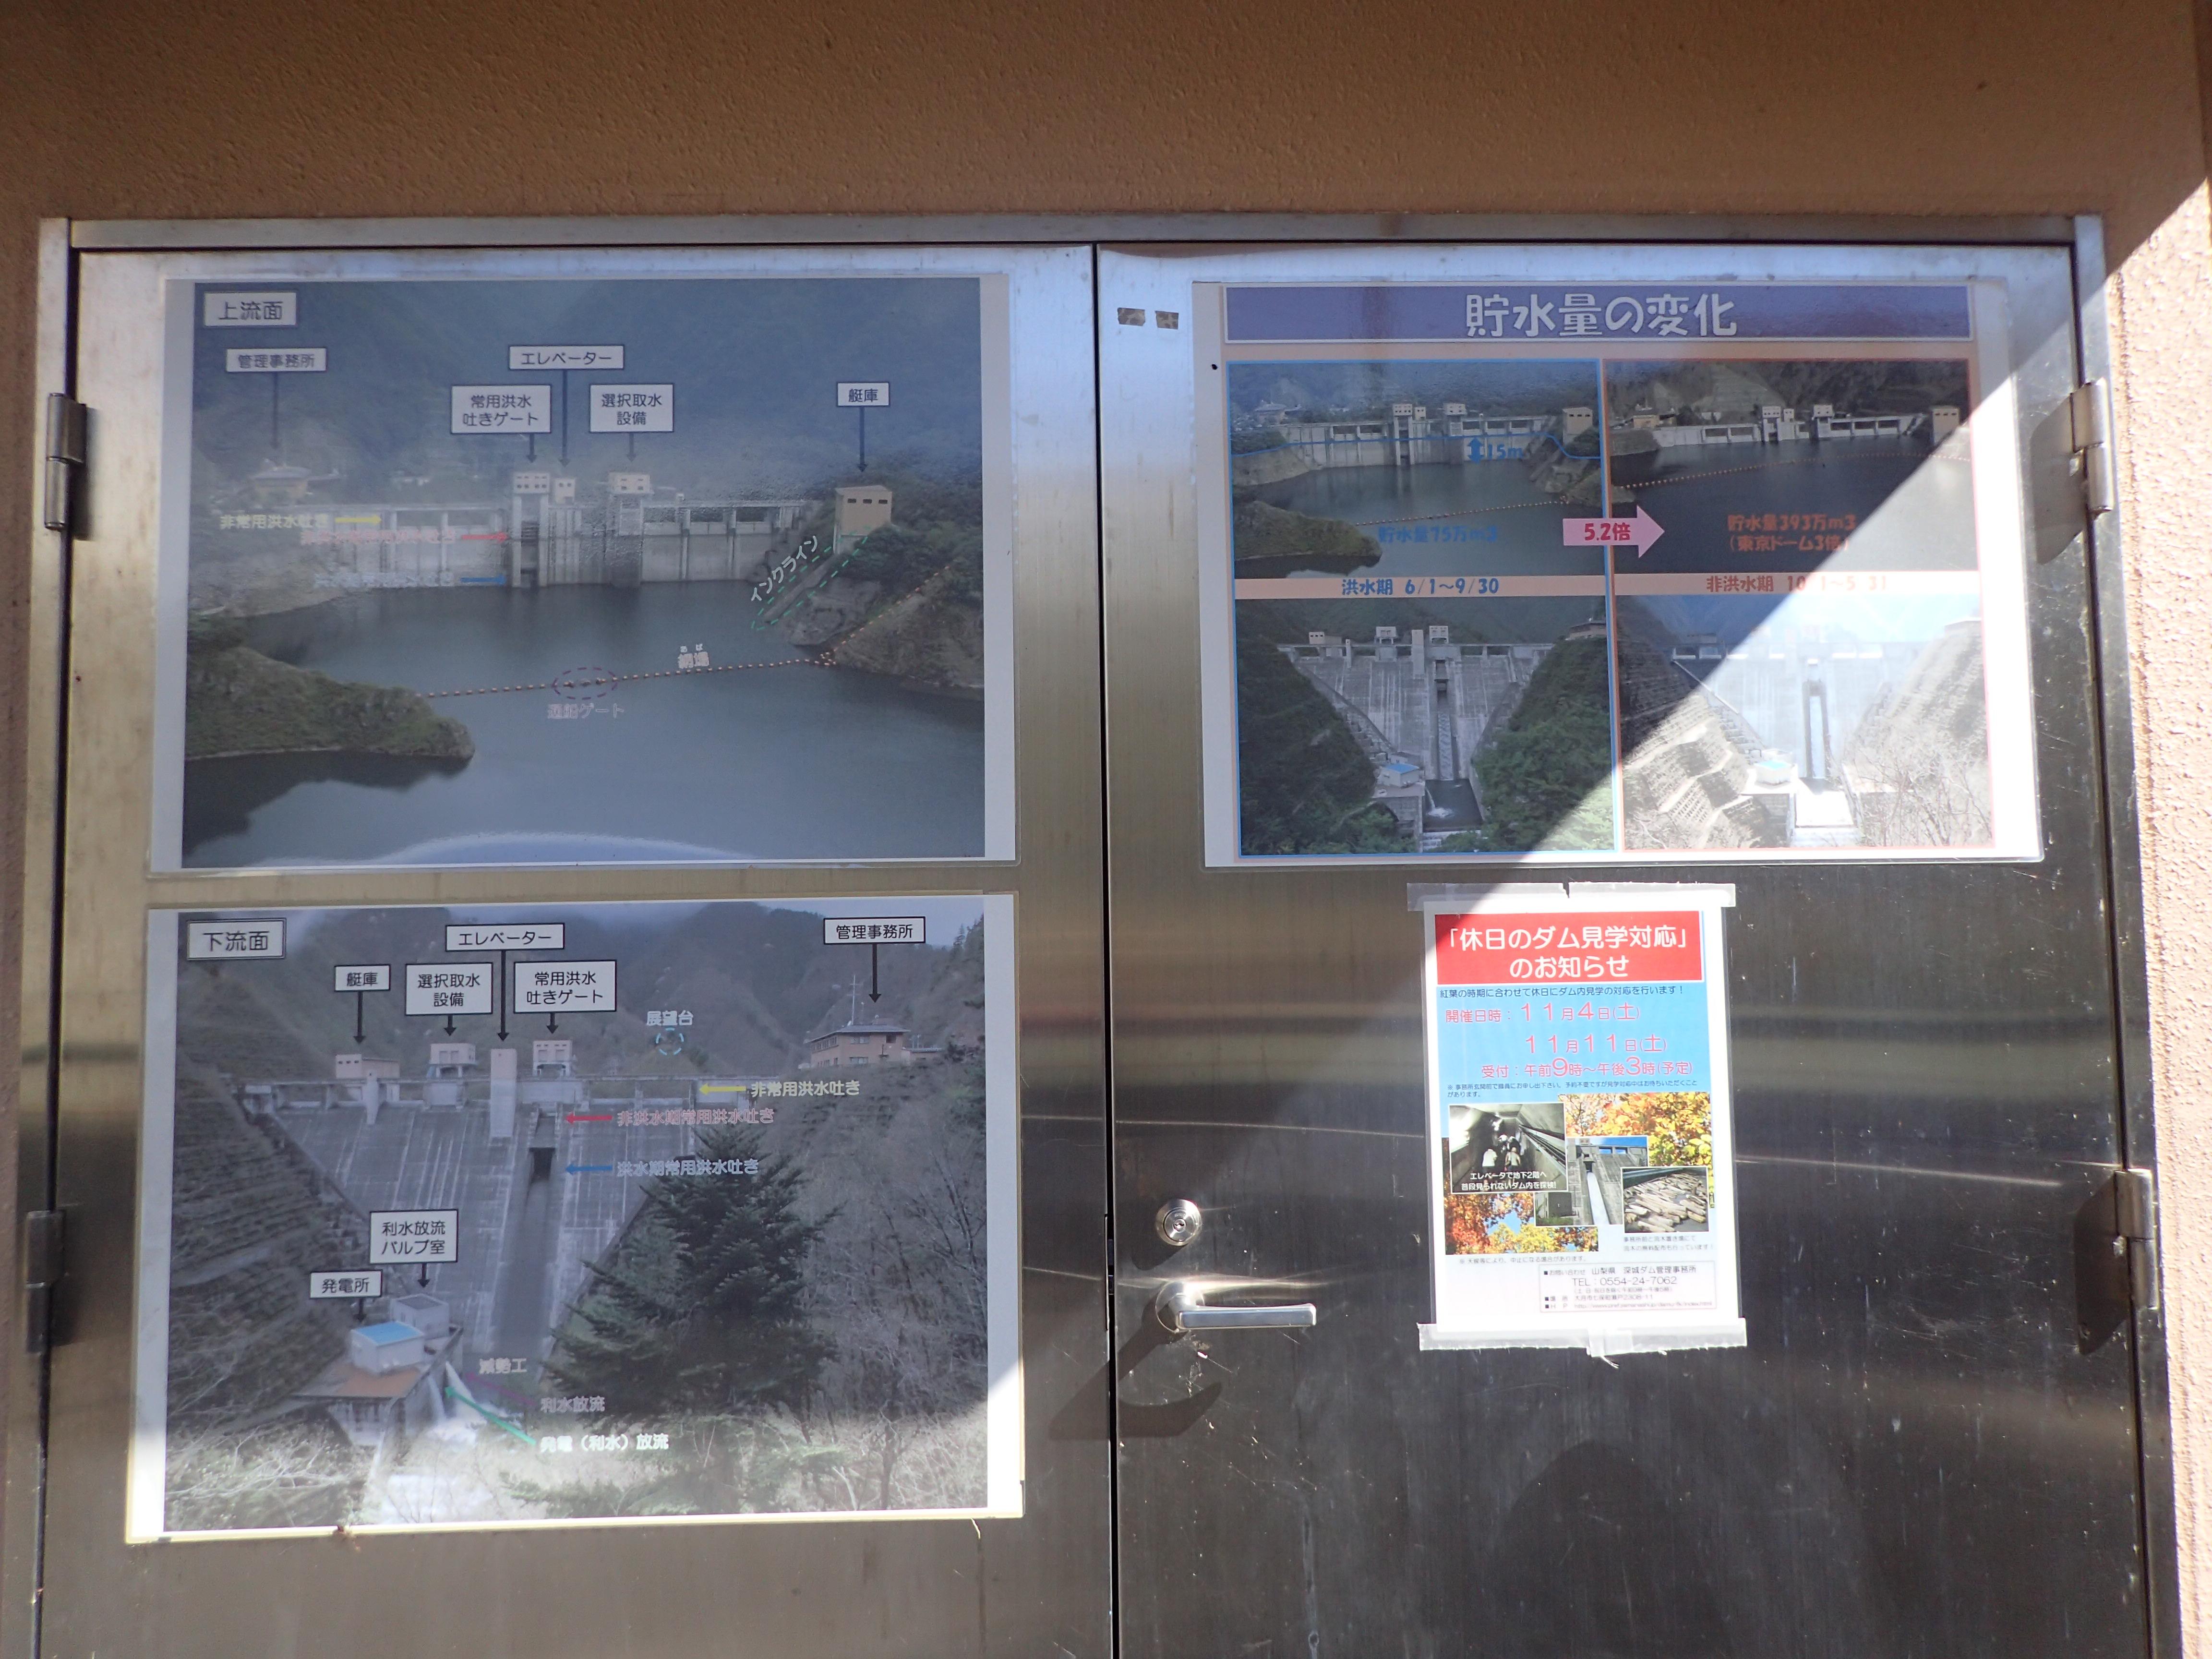 http://www.yamanashi-kankou.jp/blog/5G5fM9_PB010569.jpg